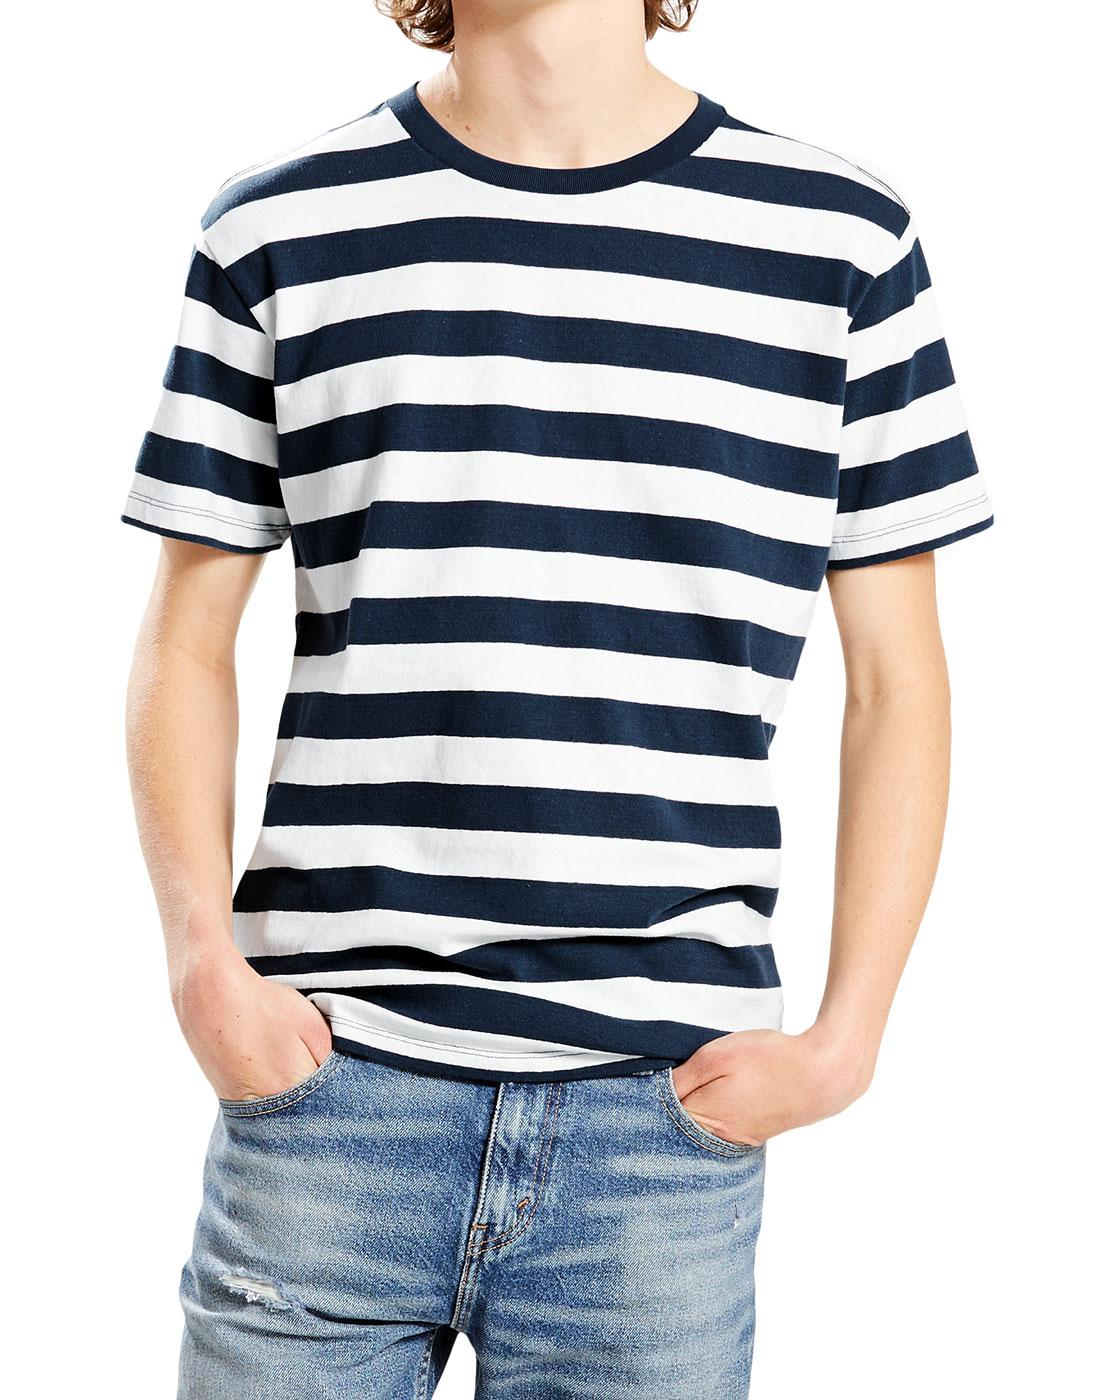 Mighty Tee LEVI'S Retro Mod Bass Stripe T-Shirt M